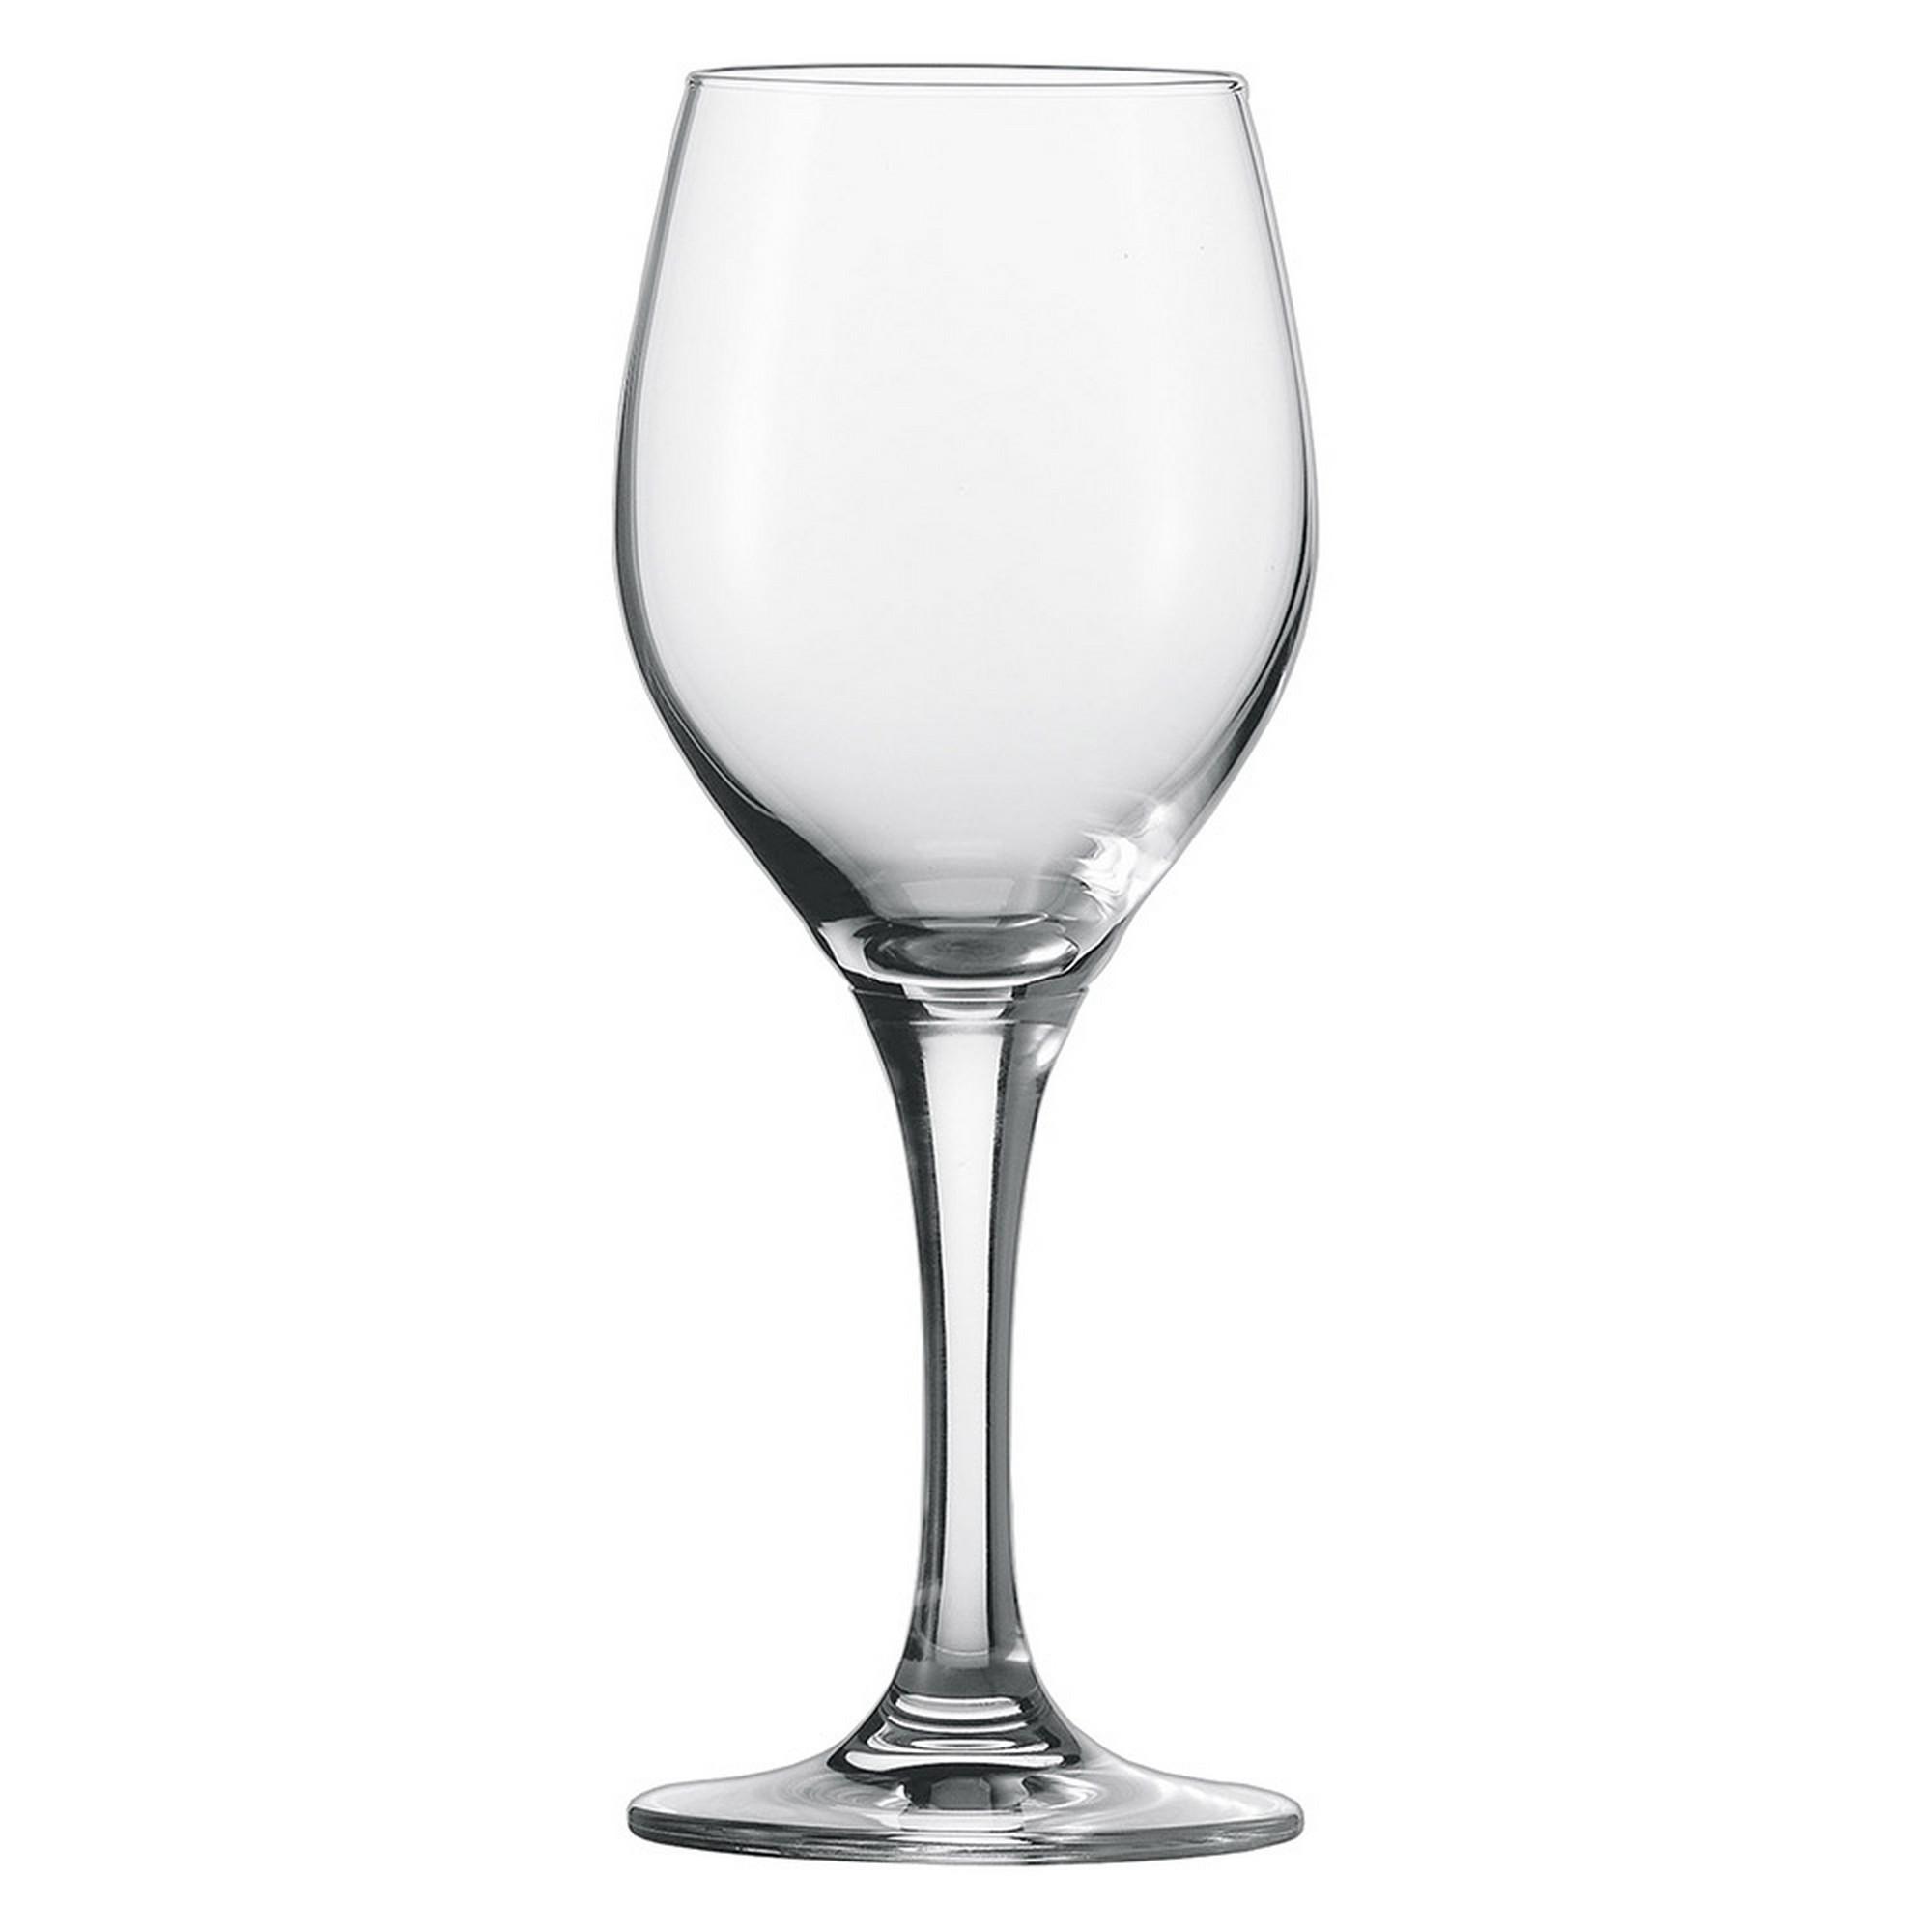 Taça para Vinho Branco 270ml Schott Zwiesel Mondial 6 Peças de Cristal